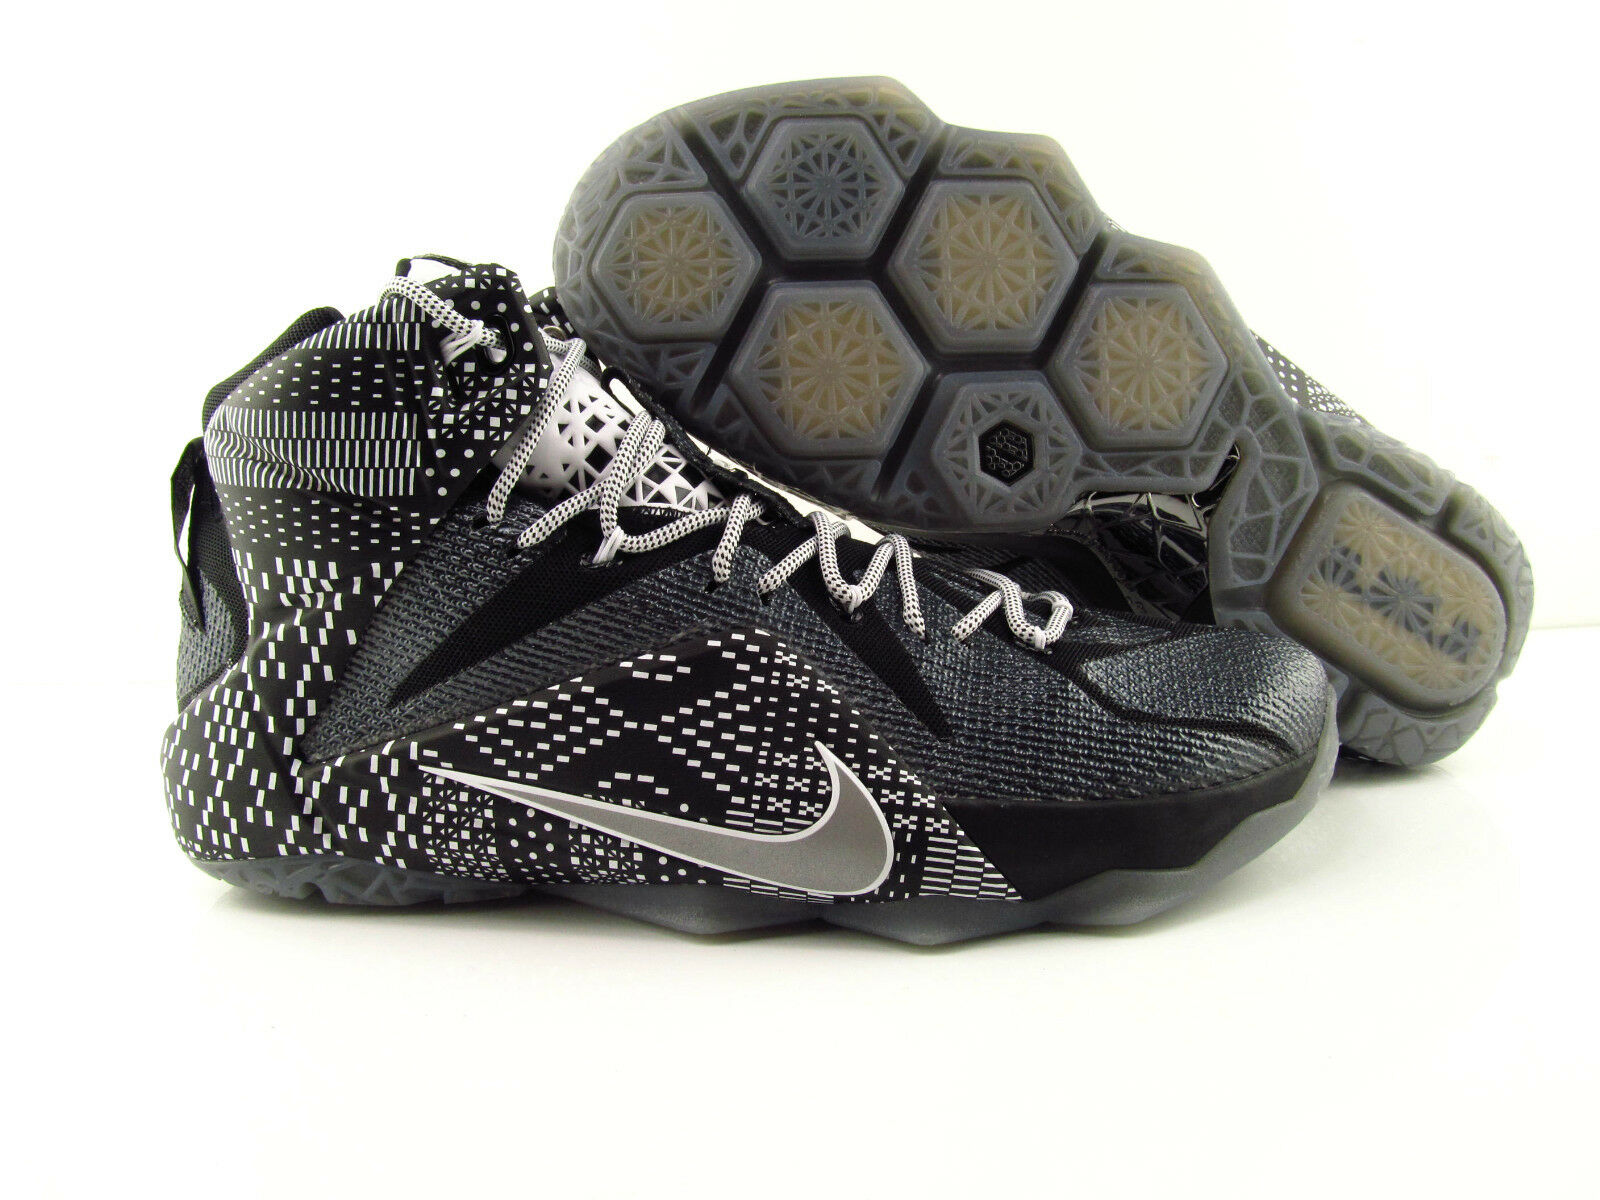 Nike Lebron XII 12 BHM   Black History Month  Basketballschuhe Eur_47.5-48.5